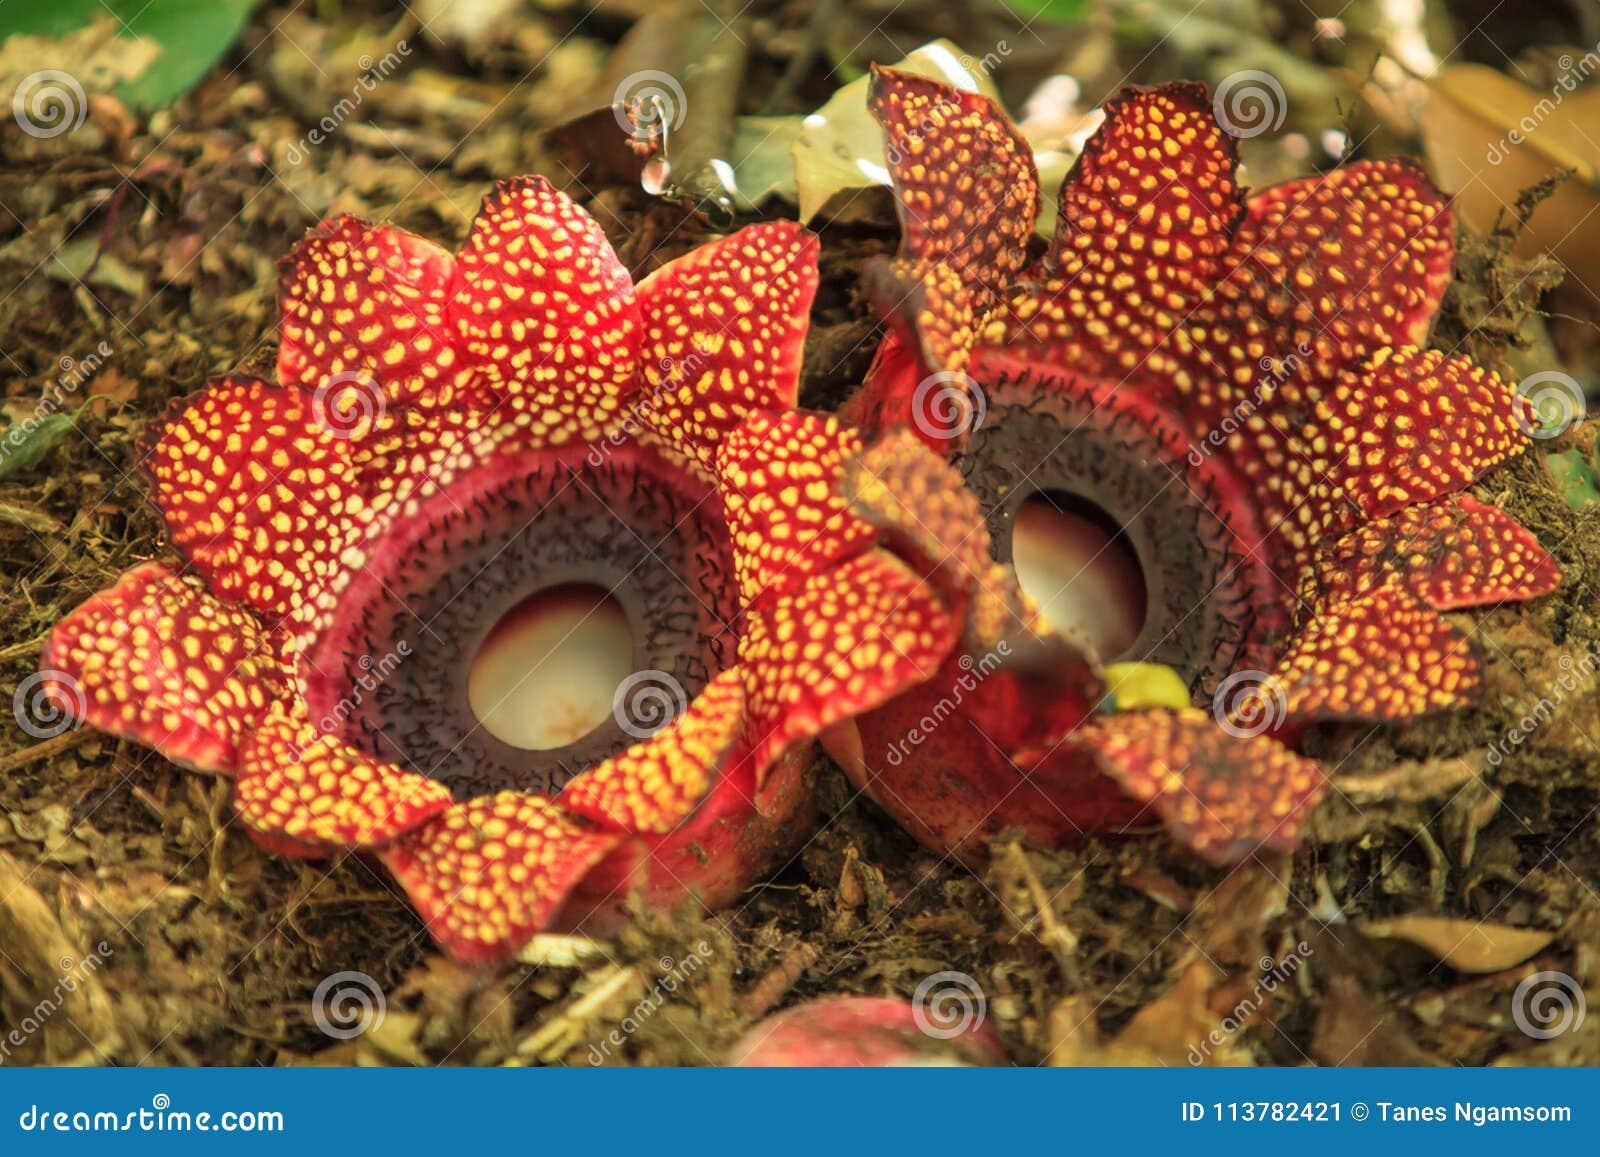 Two Rafflesia Sapria himalayana Griff flowers on Hill Evergree